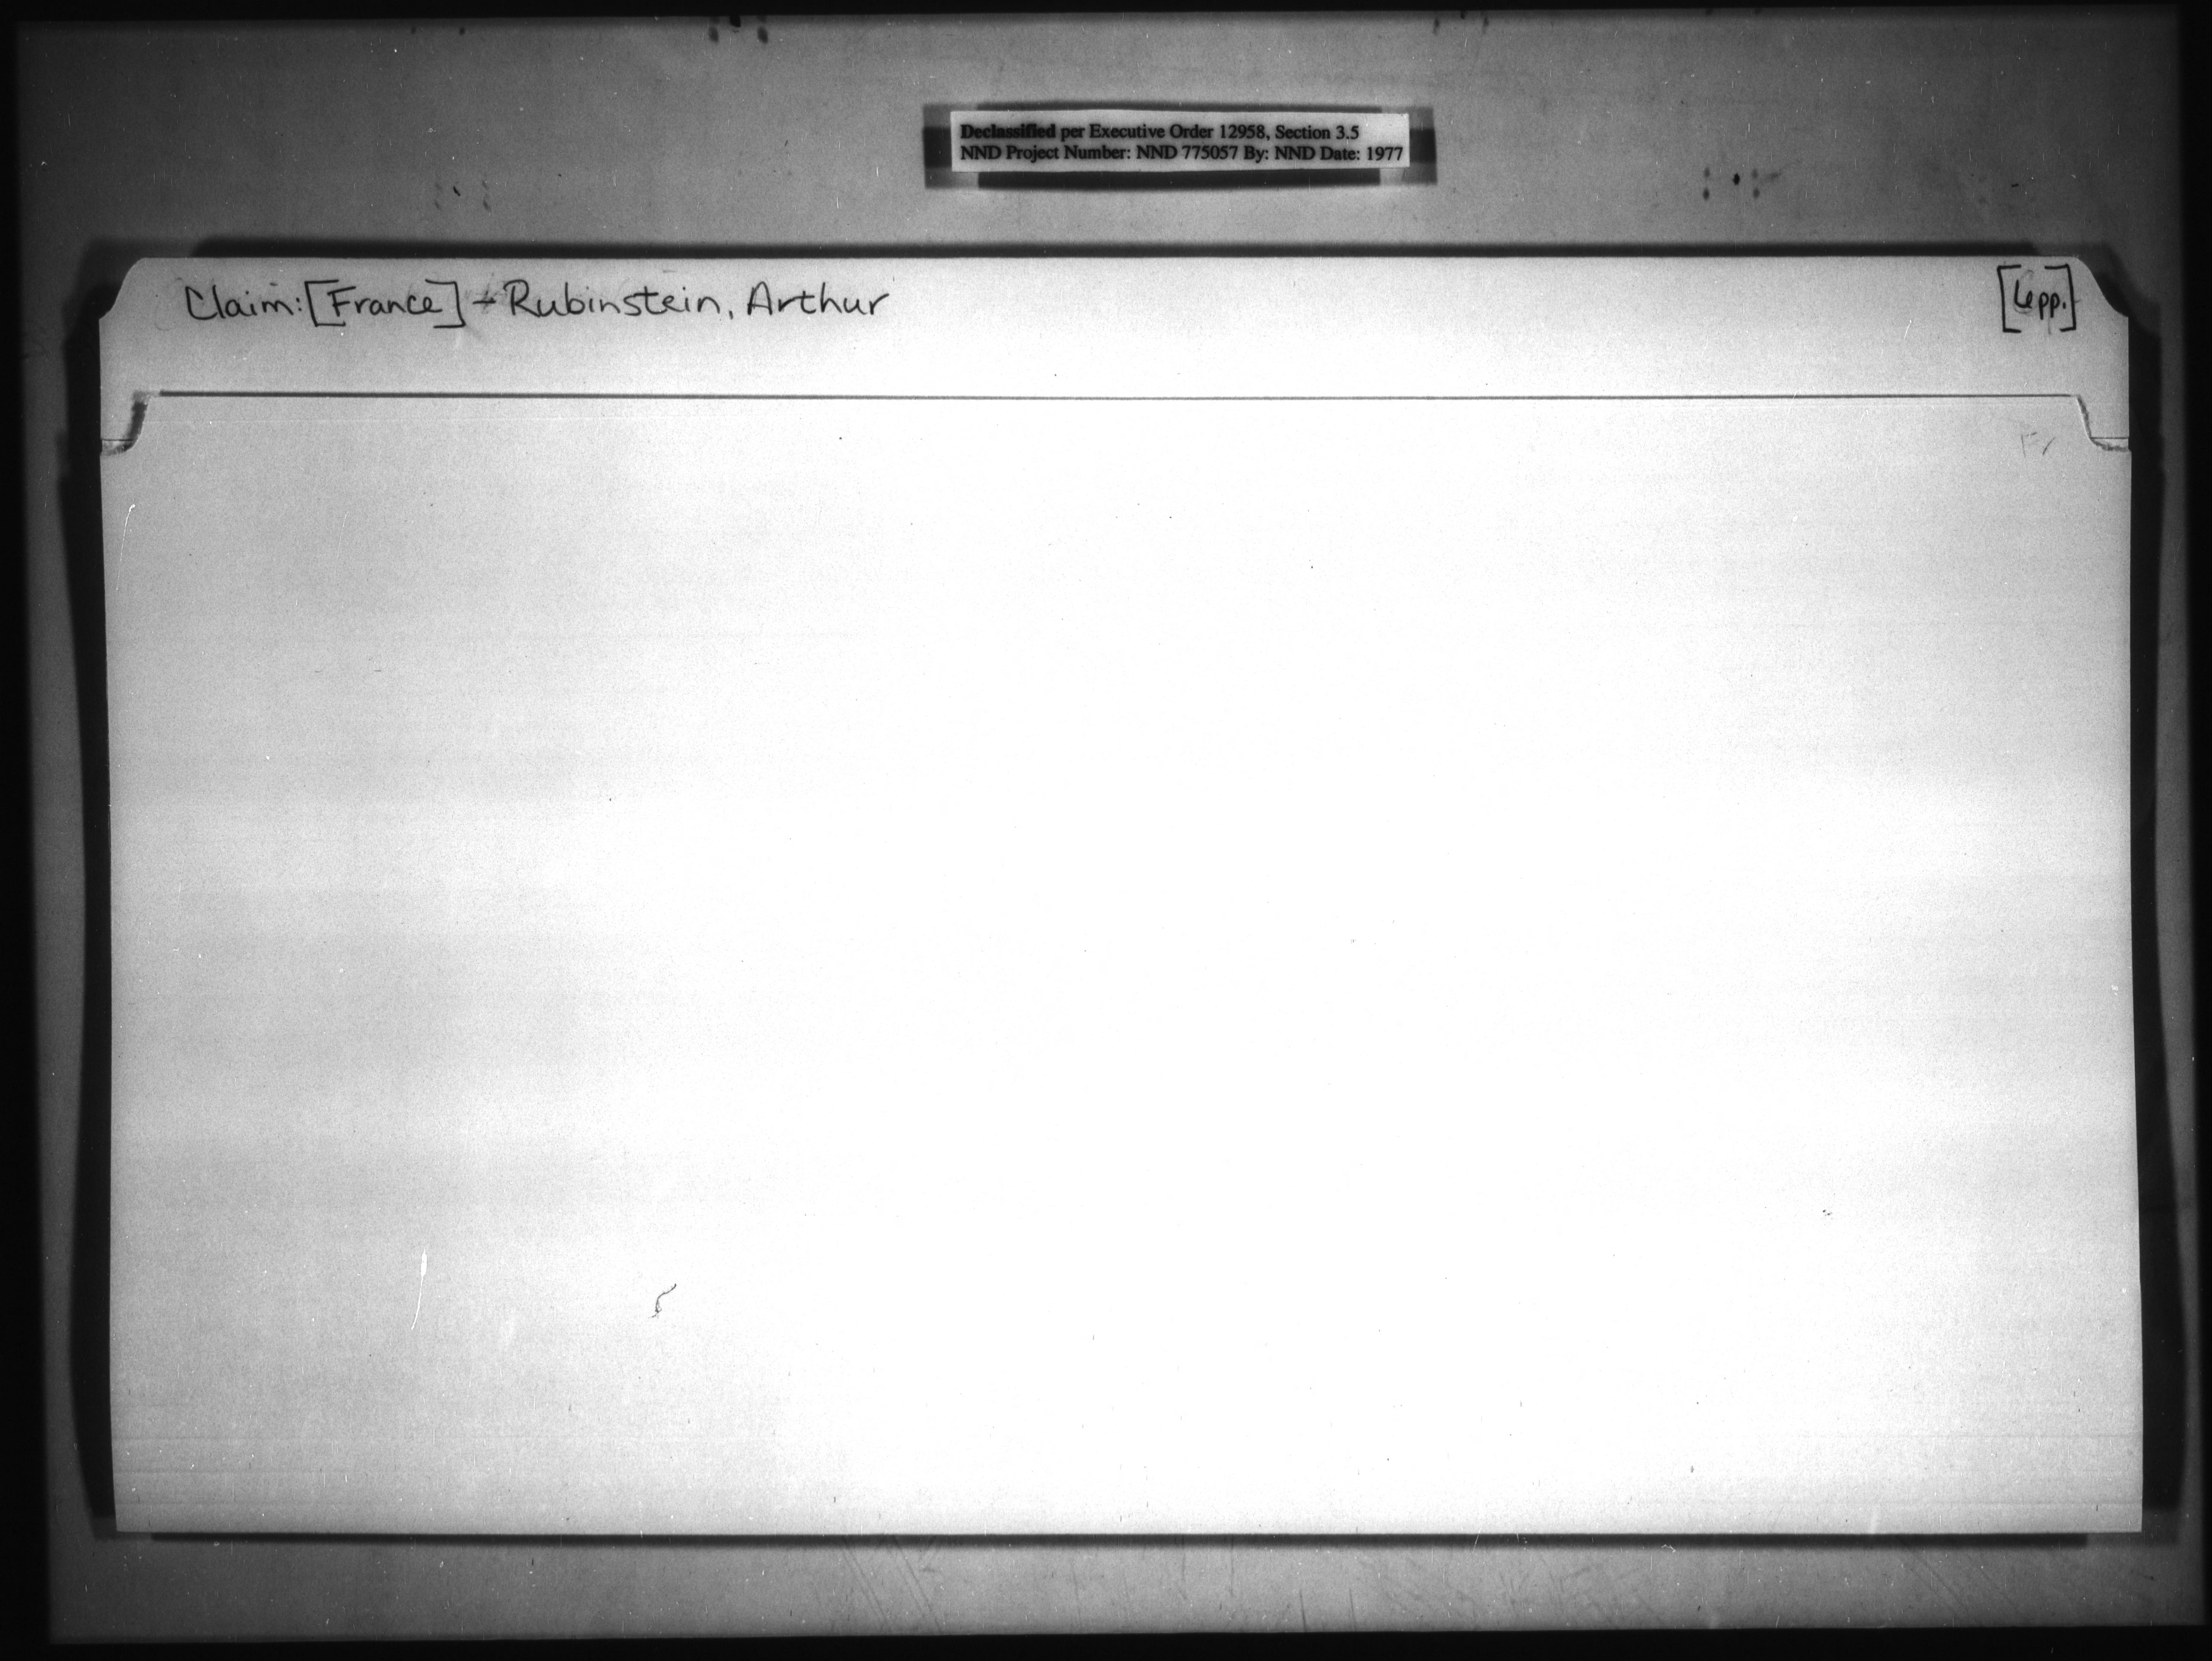 Claim: [France]-Rubinstein, Arthur